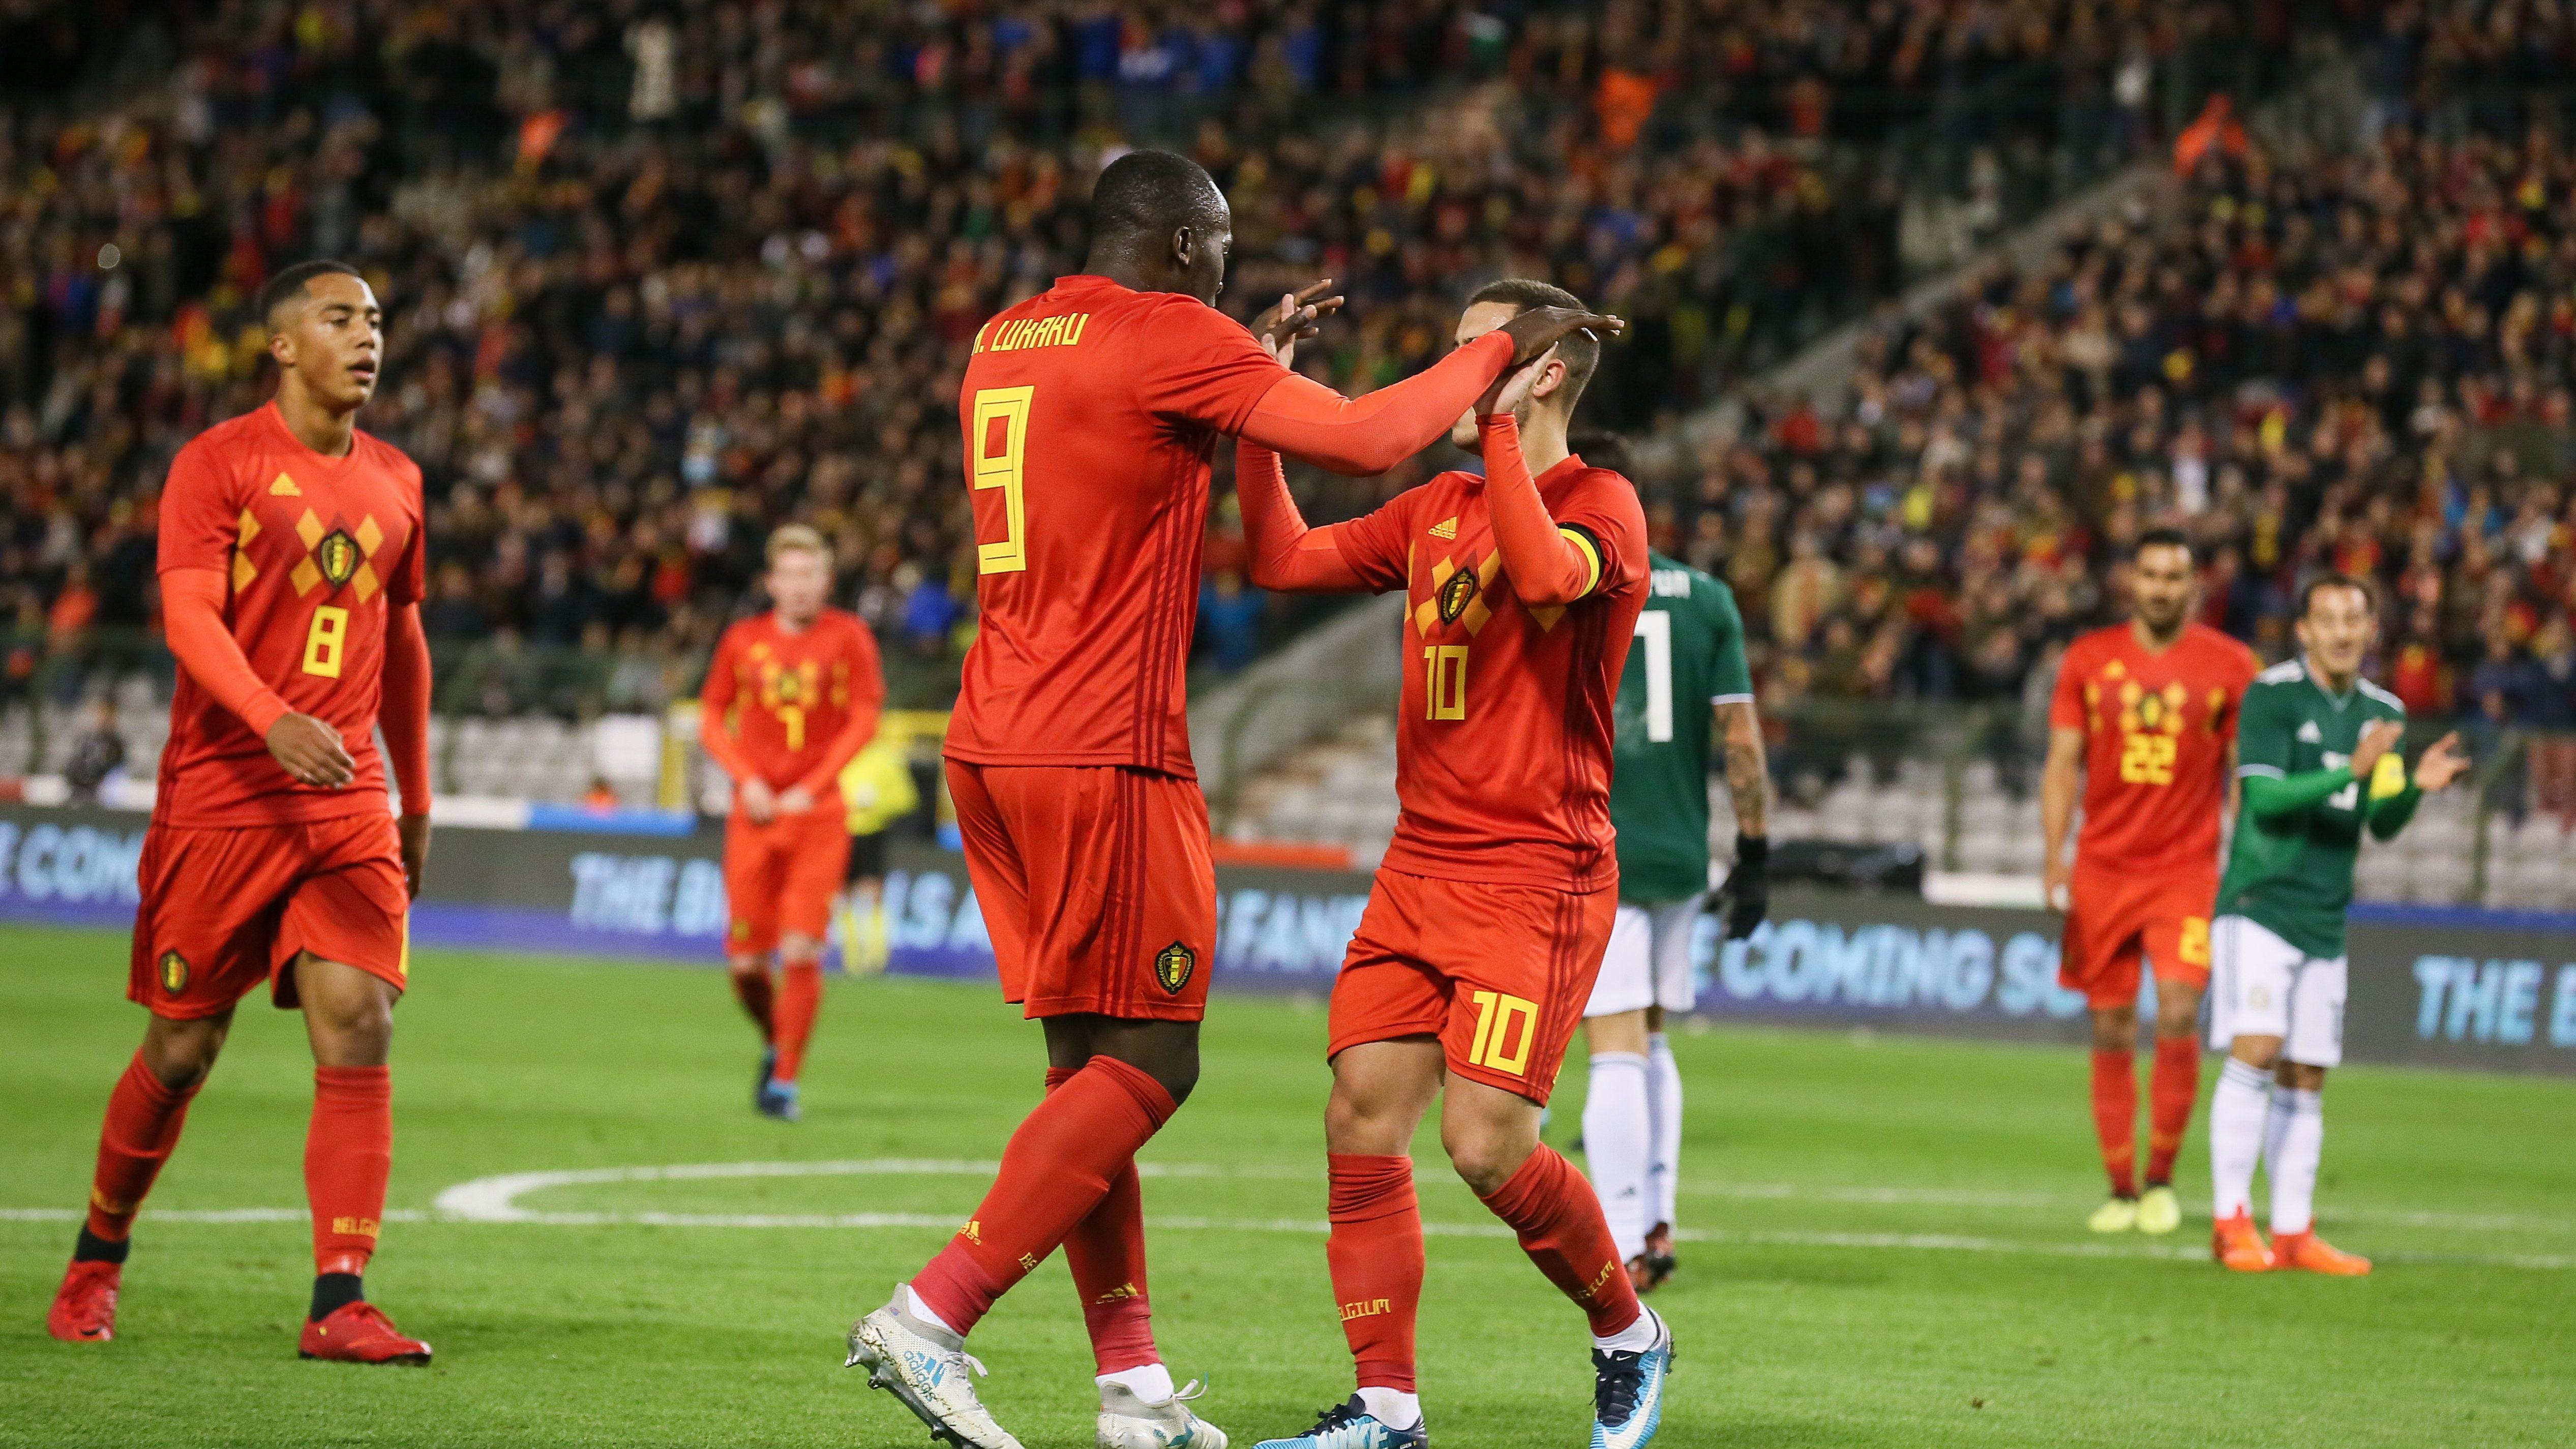 Lotul Belgiei Campionatul Mondial Fotbal Rusia Sport Libertatea Ro